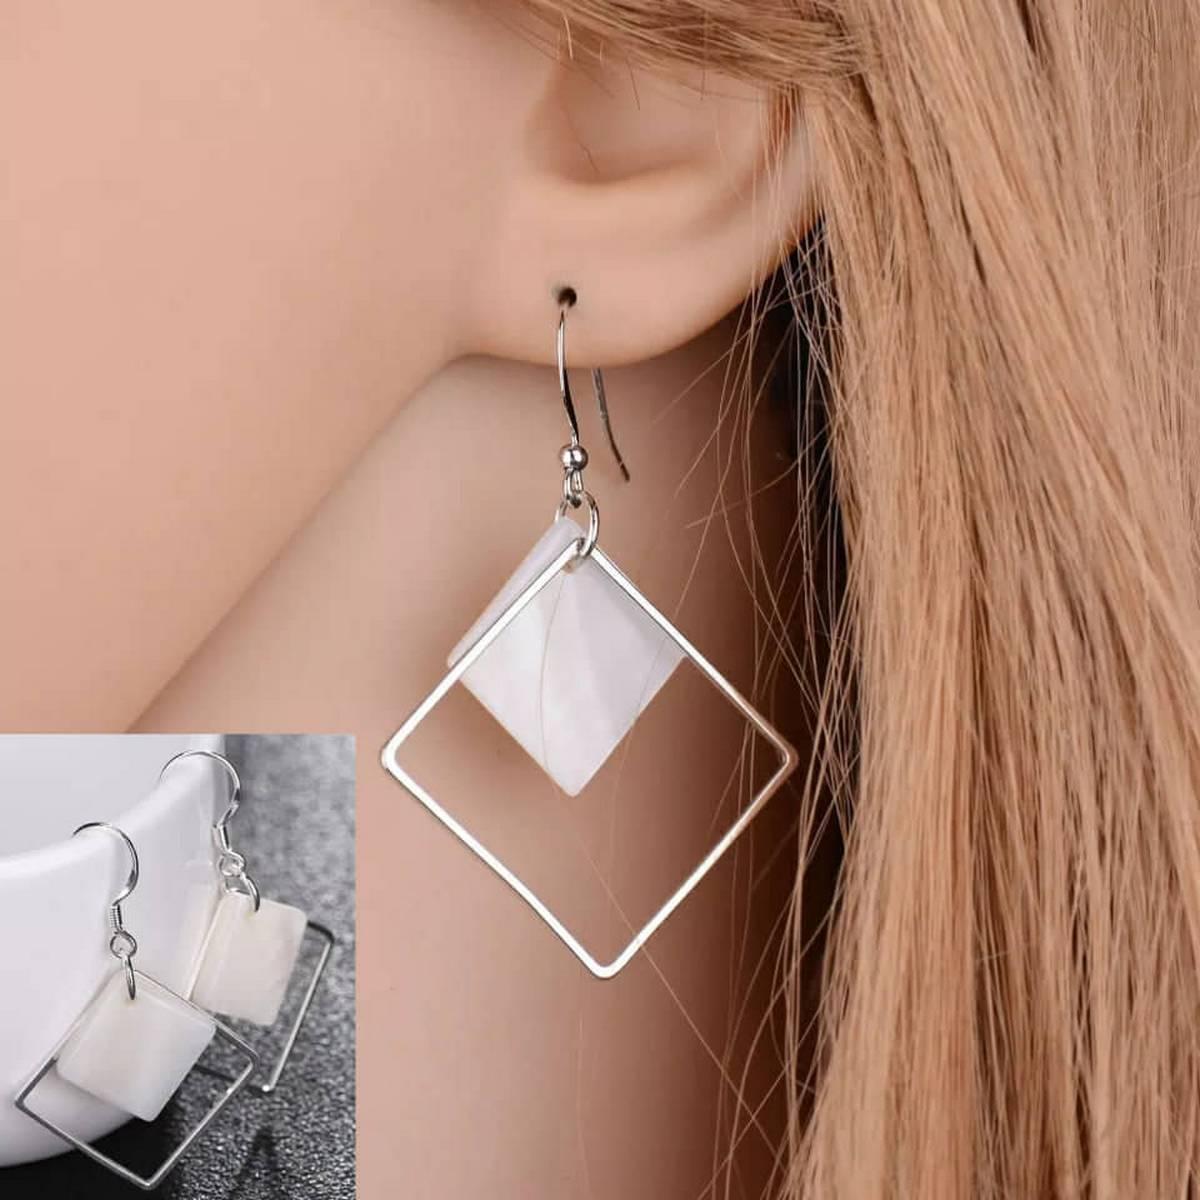 Stylish White Shellfish Square Long Earring For Girls - Pair